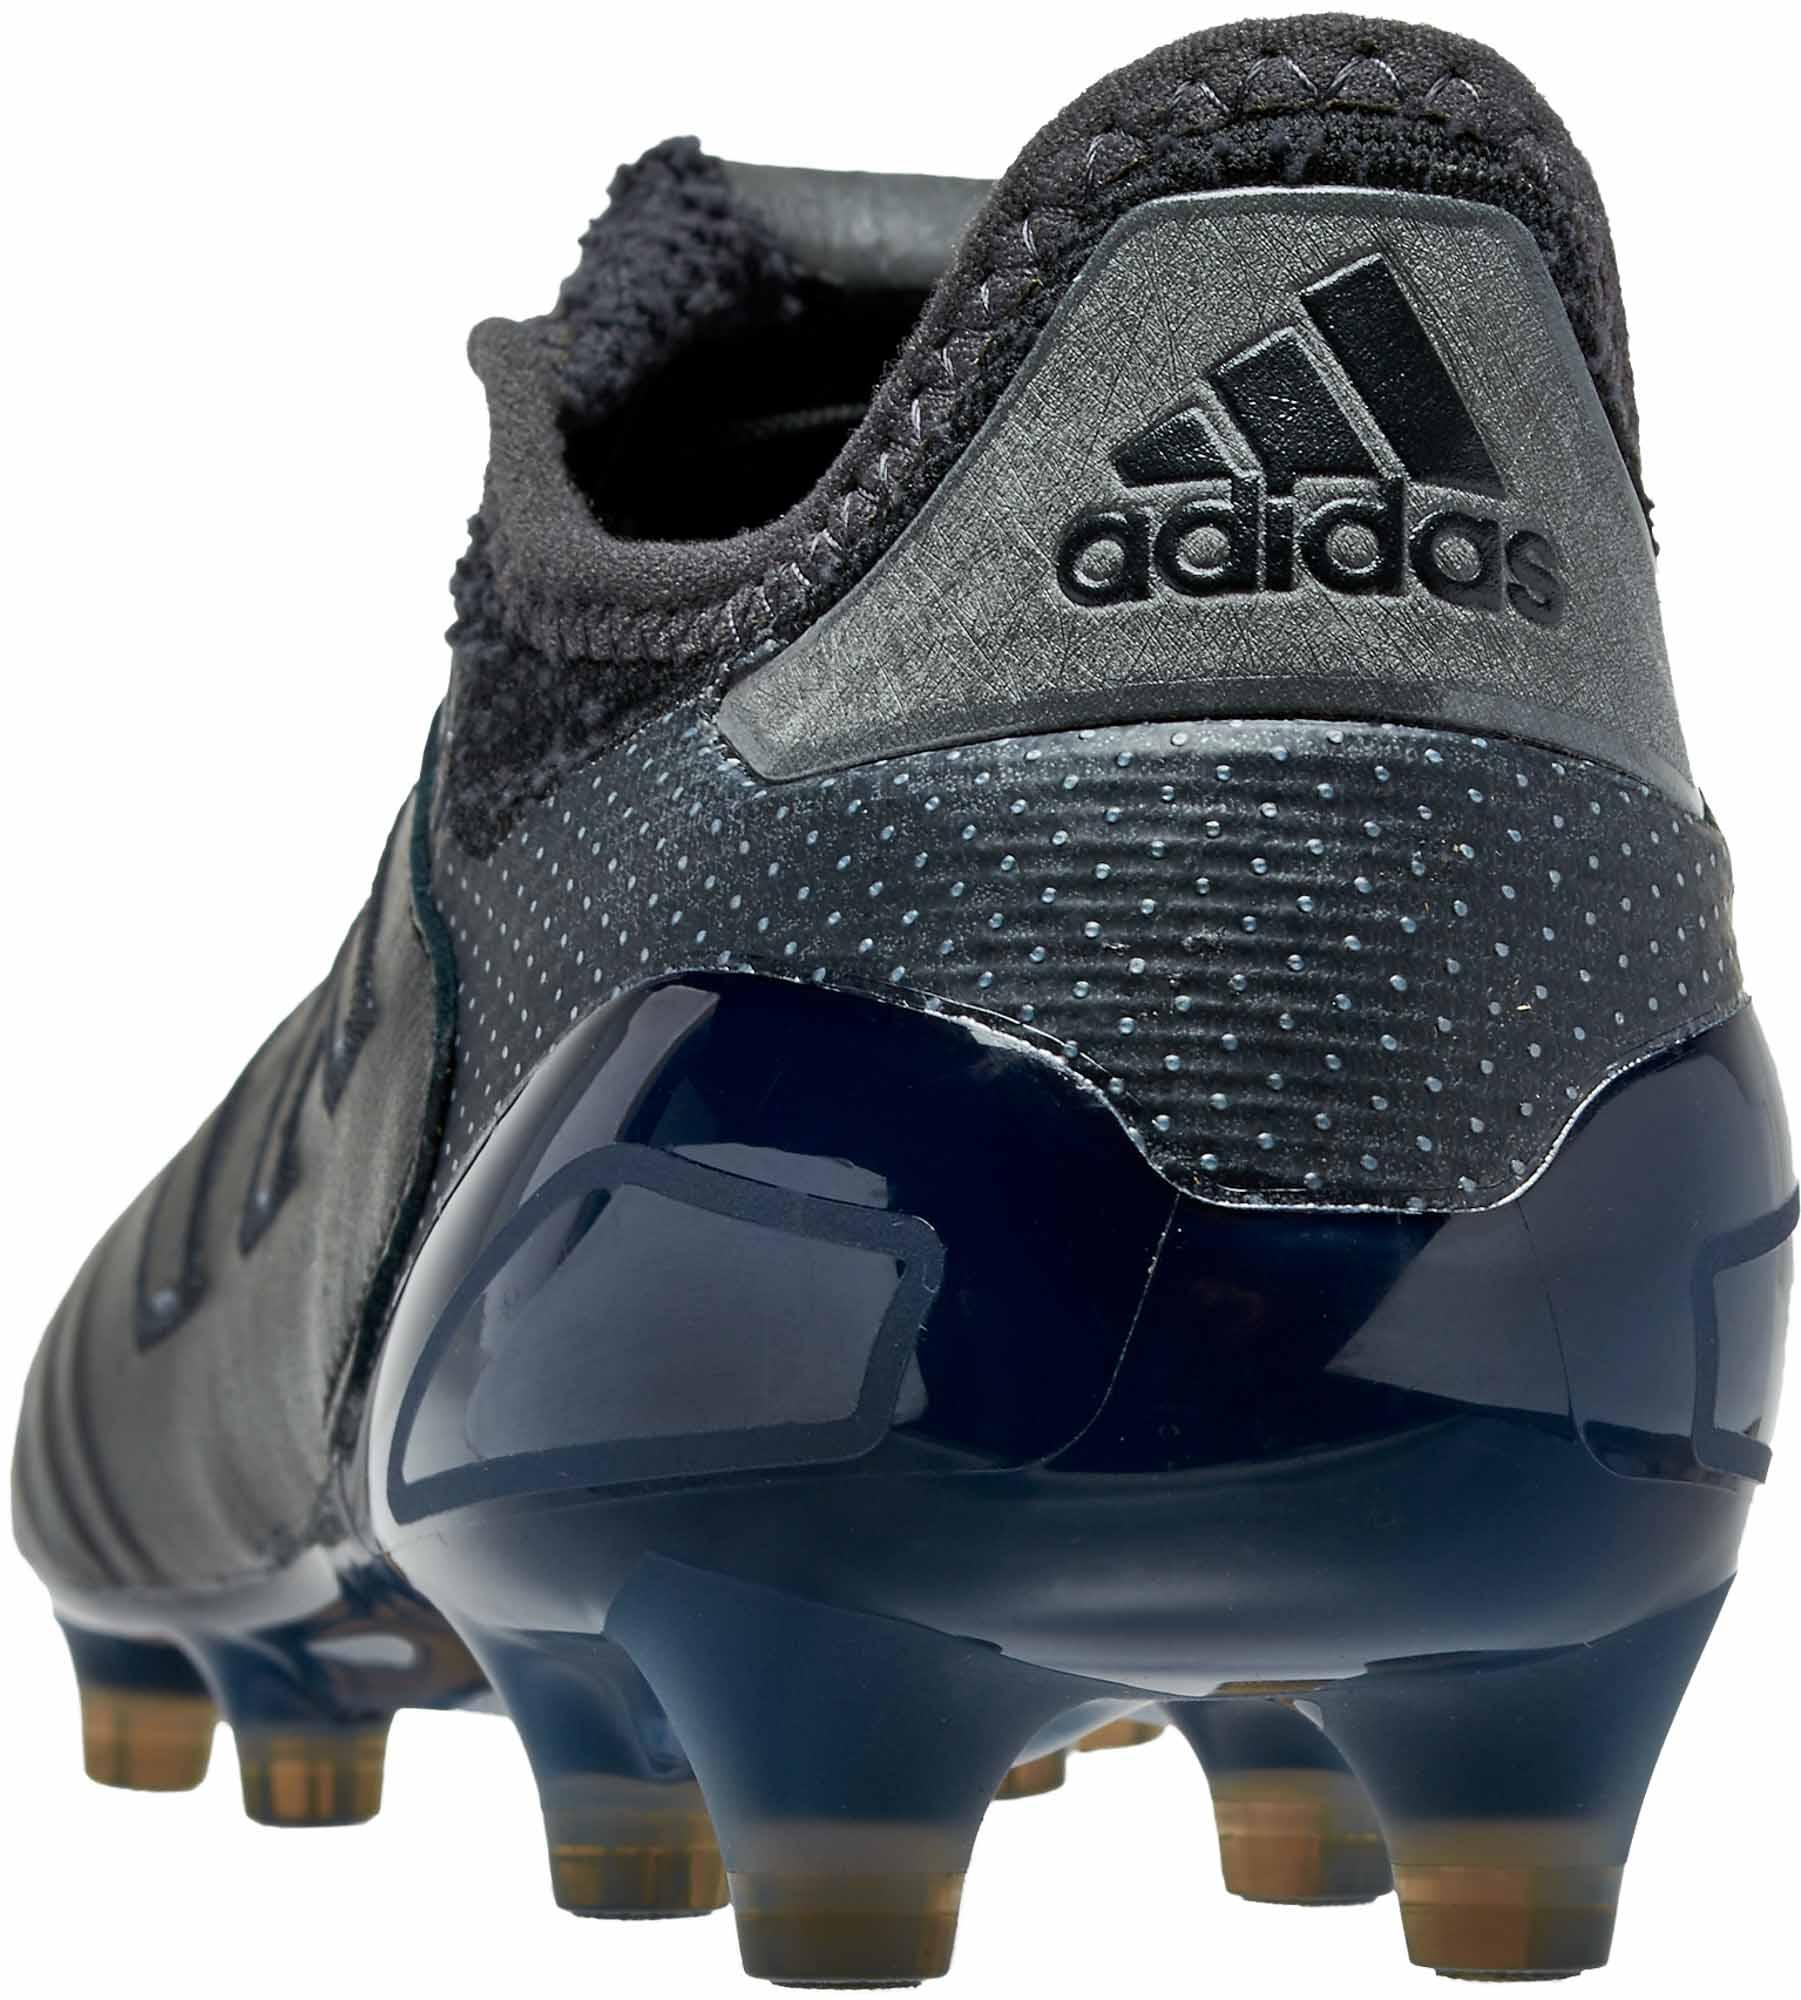 adidas Copa 18.1 FG - Black & Utility Black - Soccer Master